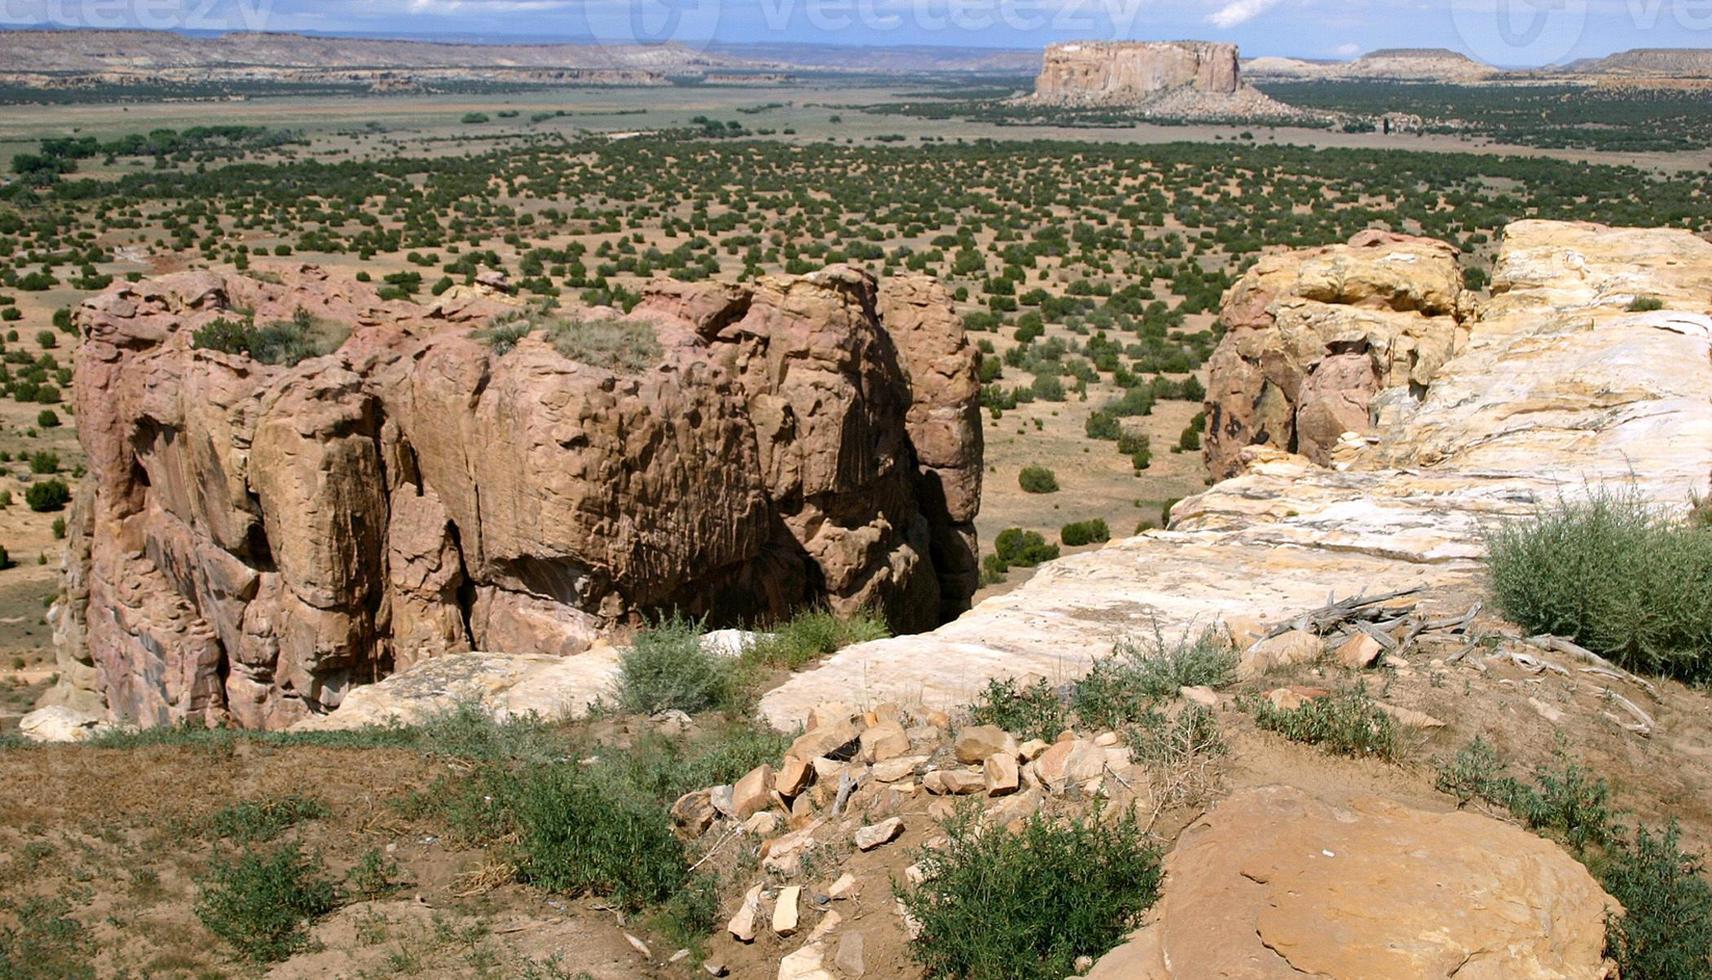 nova vista do deserto mexicano foto